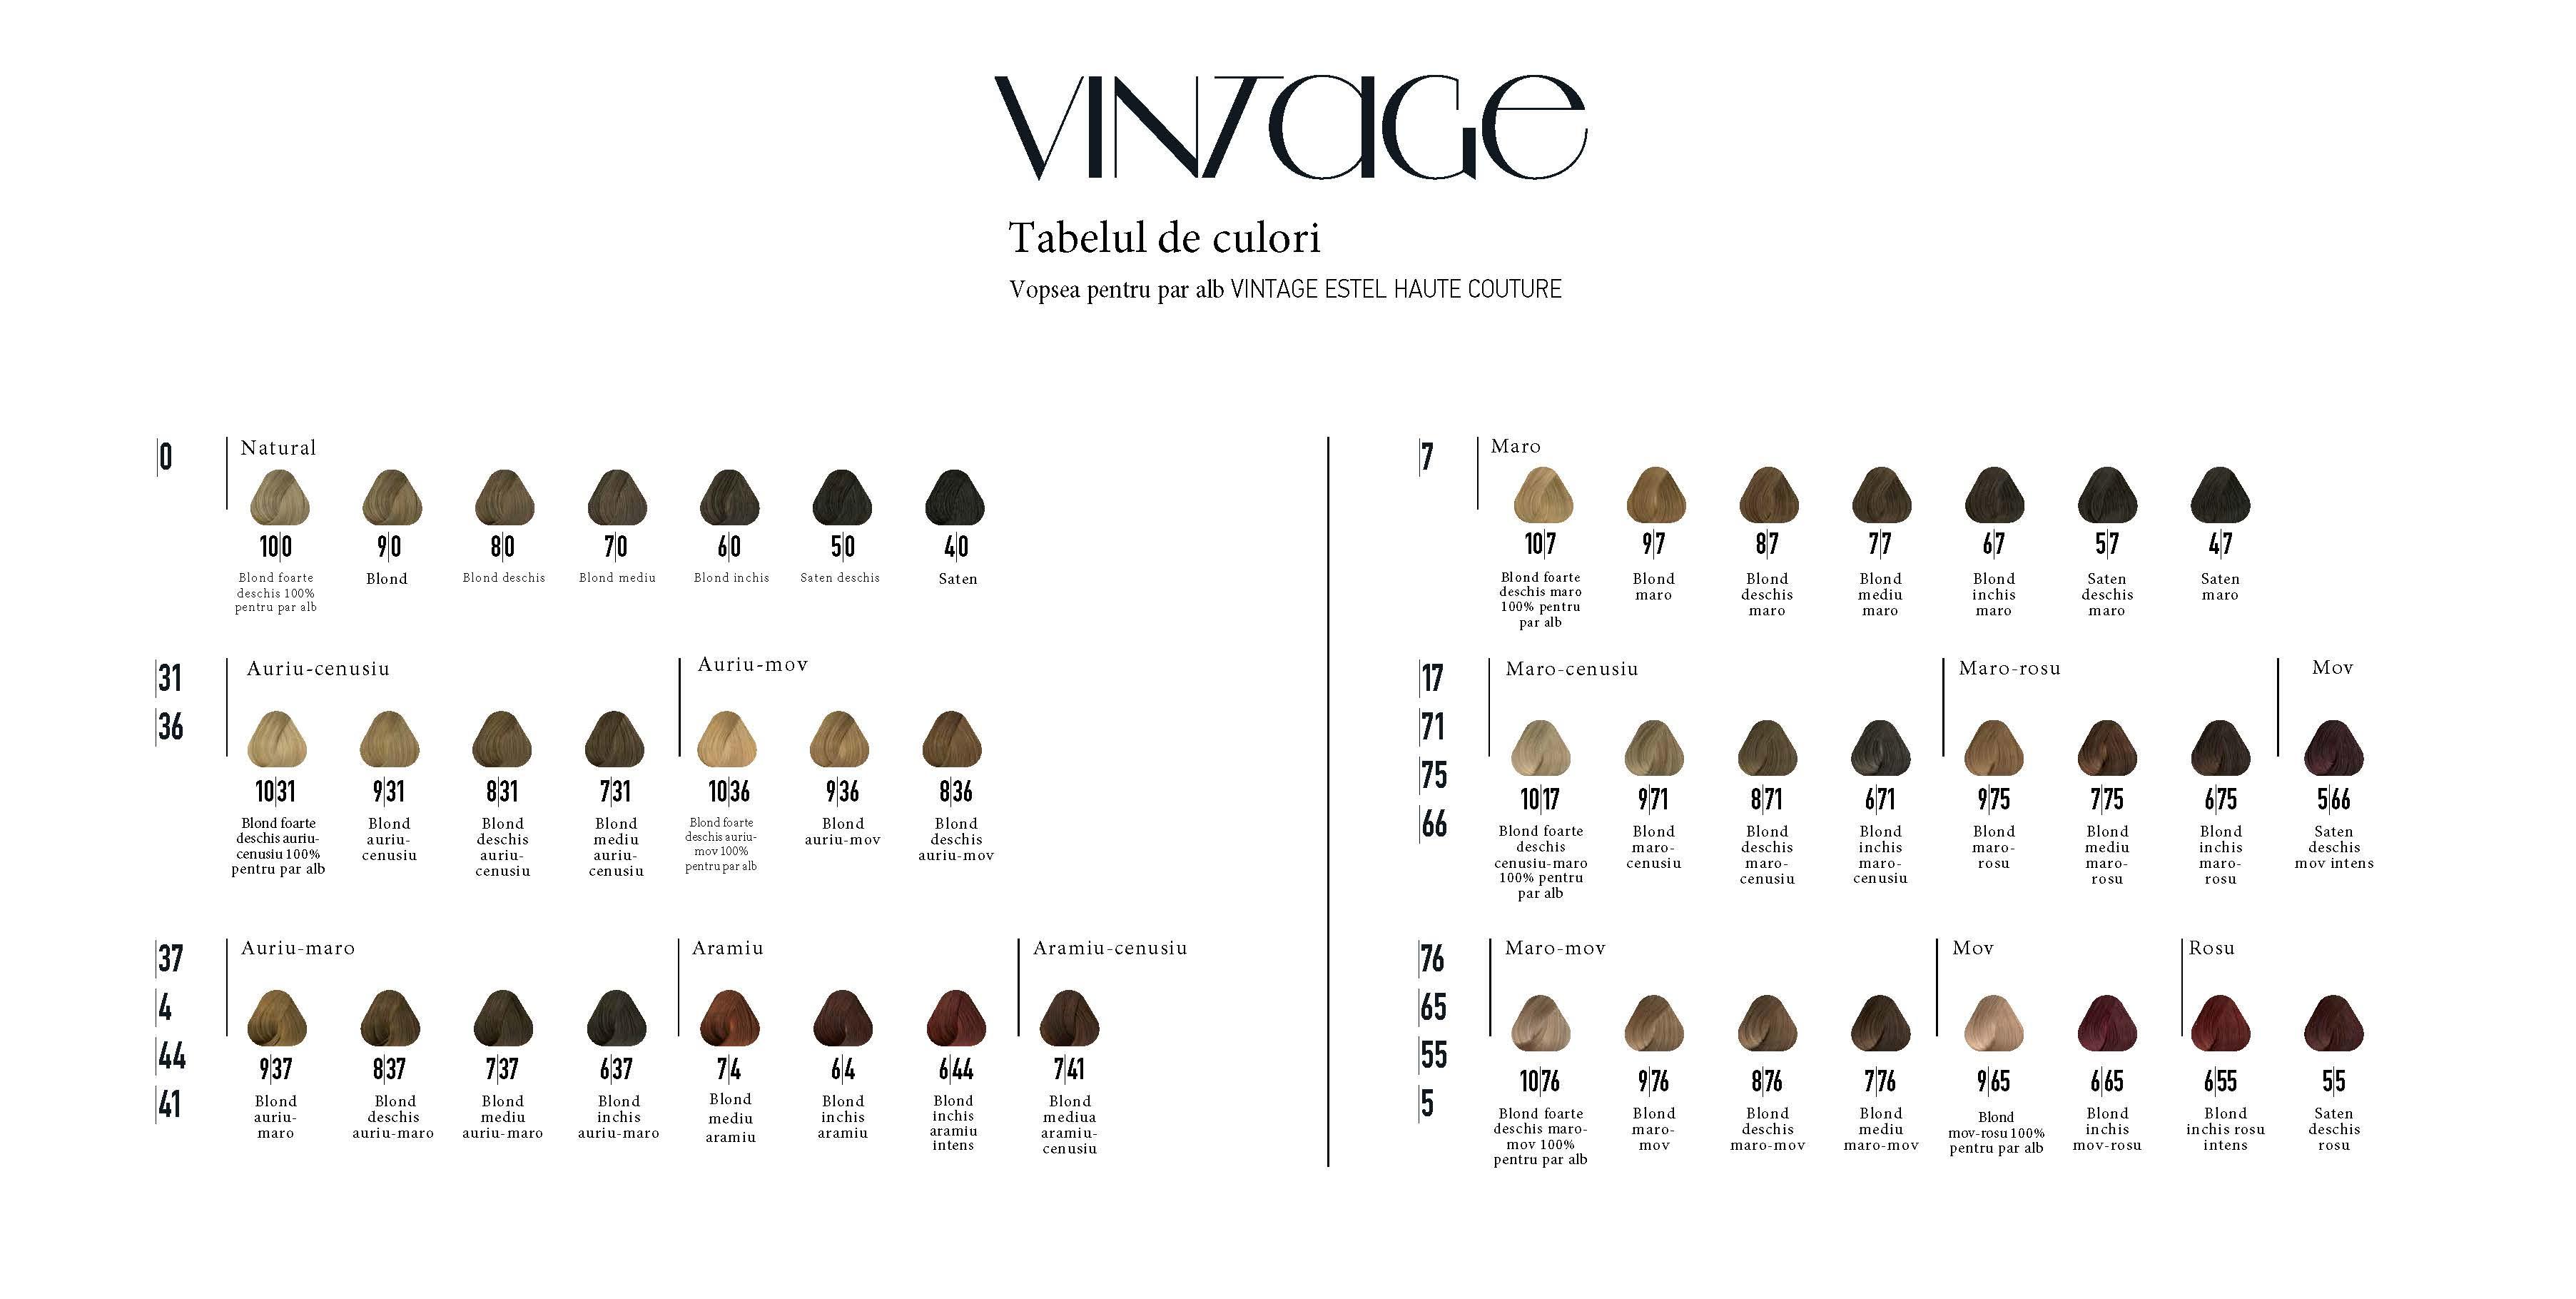 Vopsea permanenta pentru par HAUTE COUTURE Vintage 7/75 Blond mediu maro-rosu 60 ml